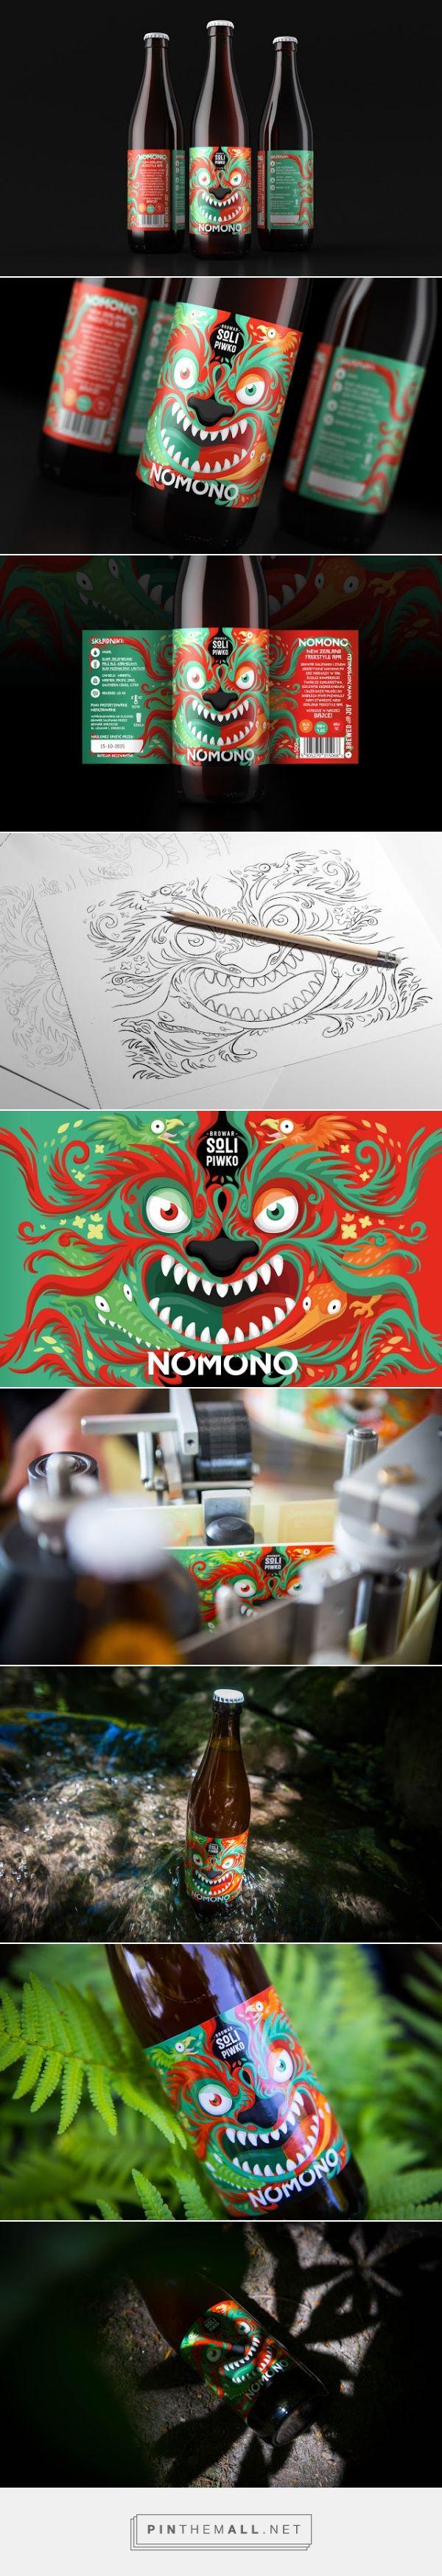 NOMONO #NewZealand Freestyle APA #beer #packaging designed by NOMONO - http://www.packagingoftheworld.com/2015/06/nomono-new-zealand-freestyle-apa.html